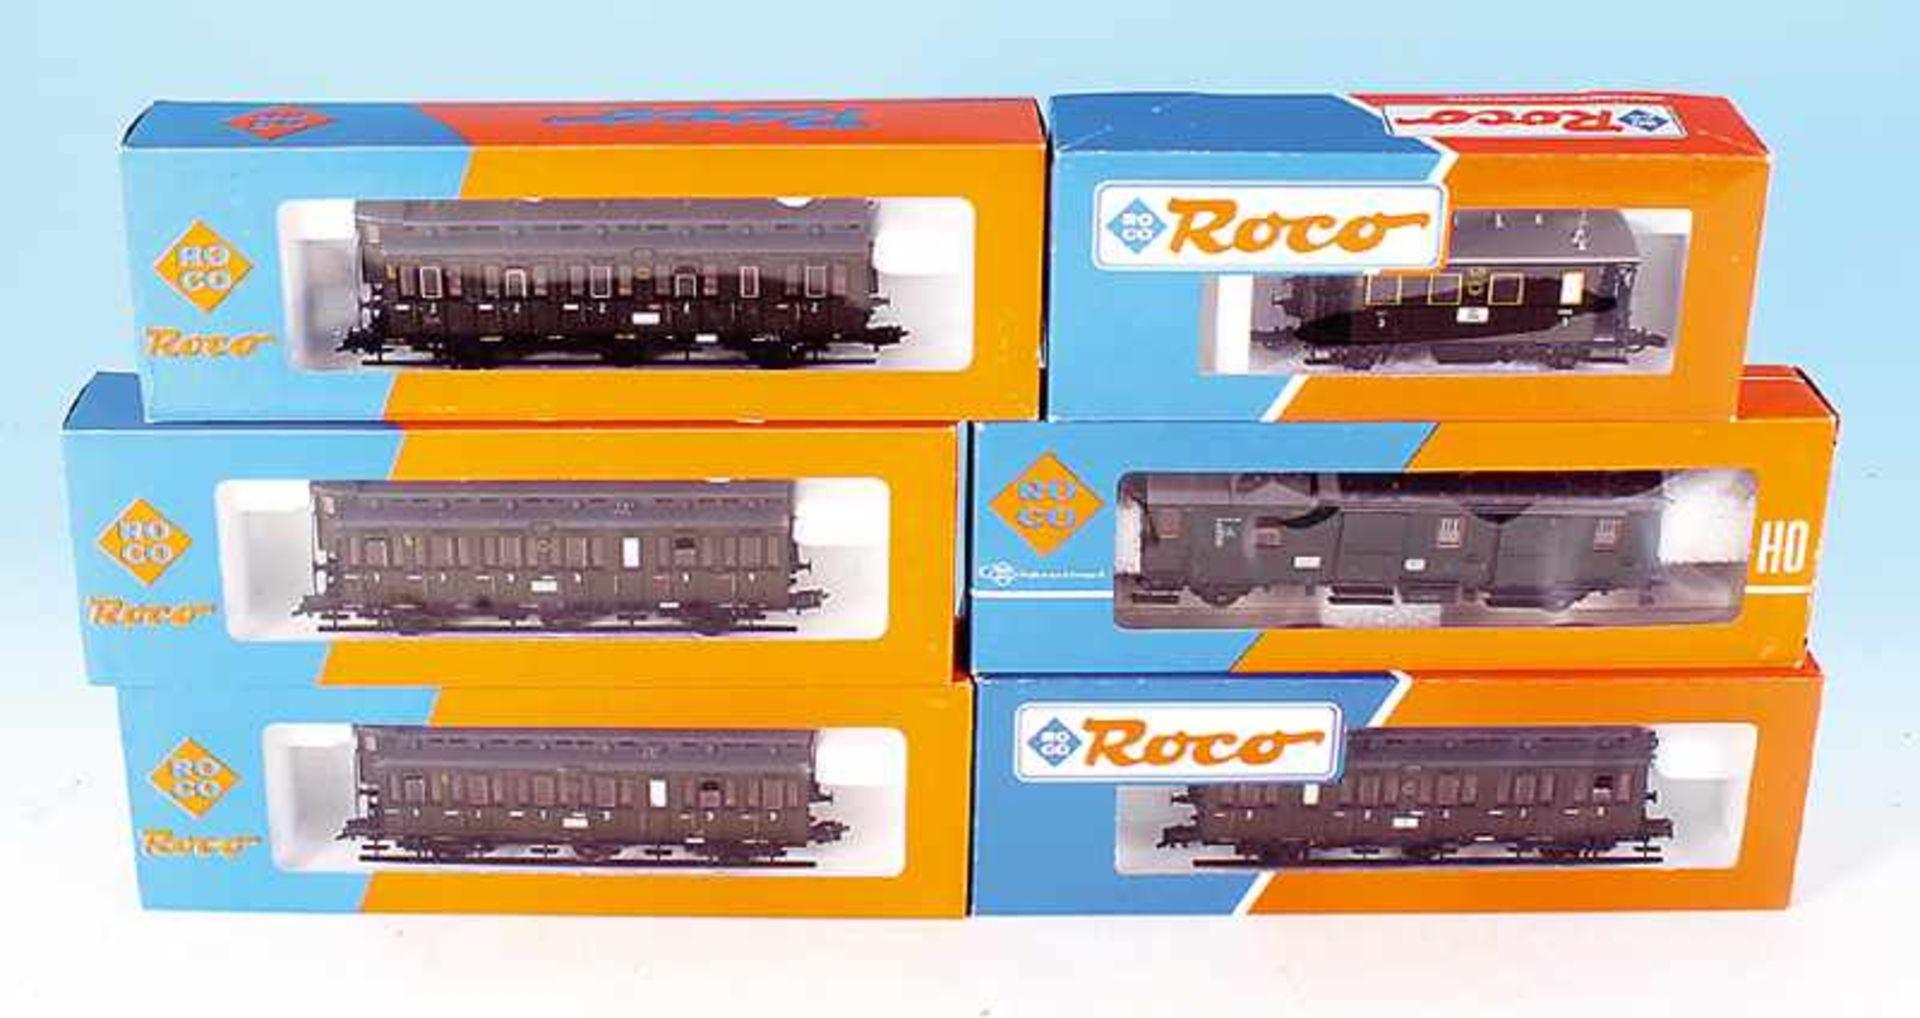 Los 48 - 6 ROCO Personen- und Packwagen